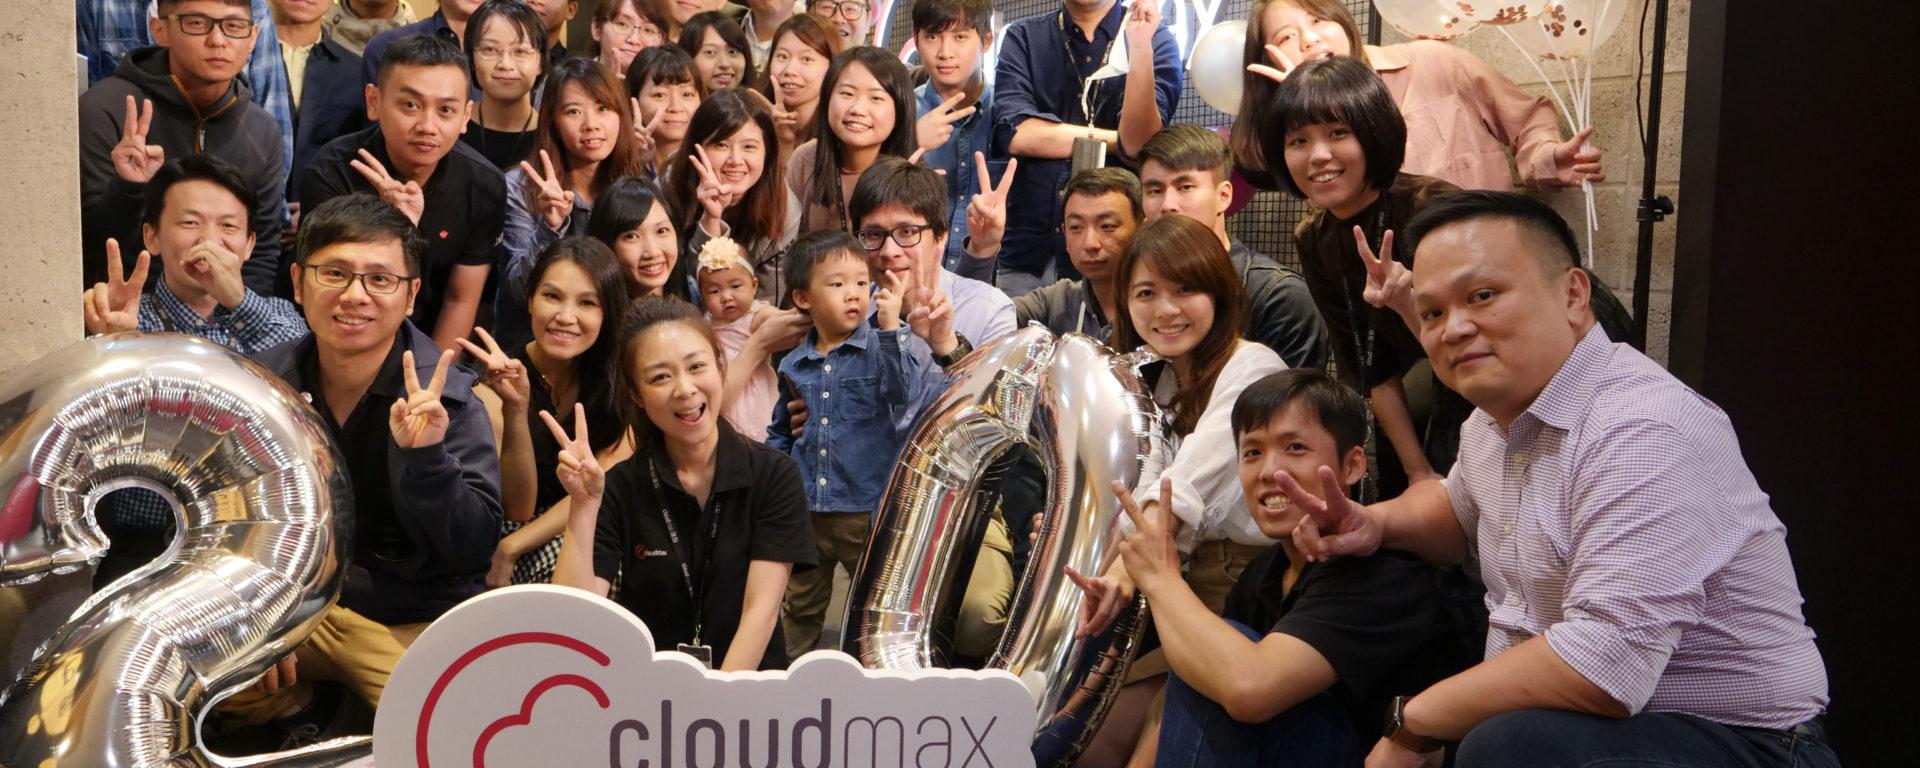 Cloudmax20th 全體合照